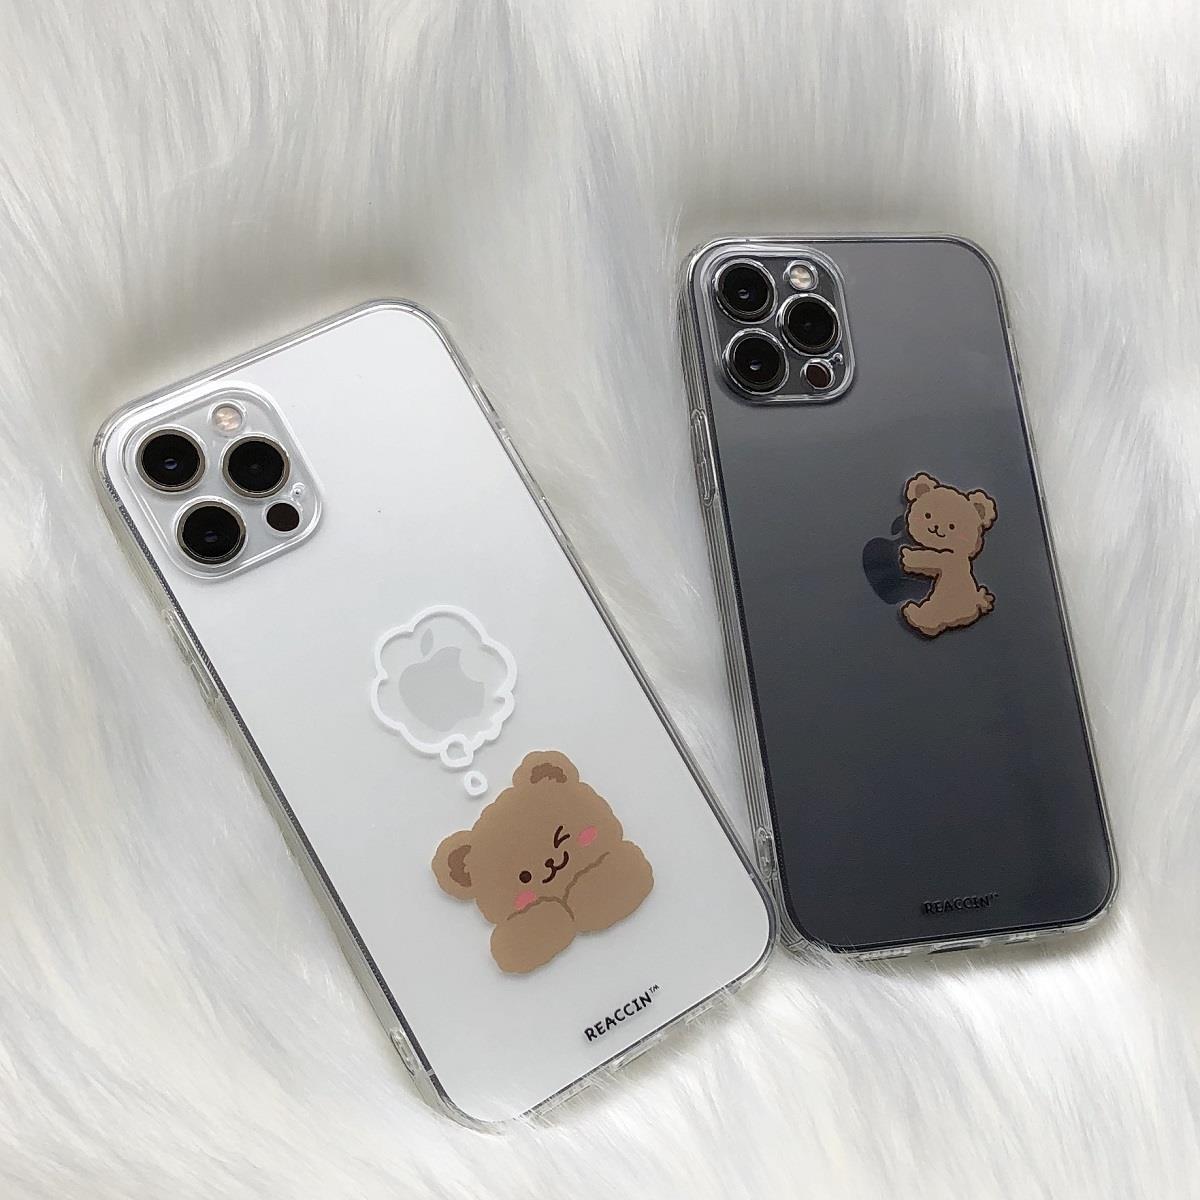 amor一中日韓系內衣 ins透明可愛卡通小熊蘋果12手機殼適用iphone11/xr/11ProMax硅膠7plus/